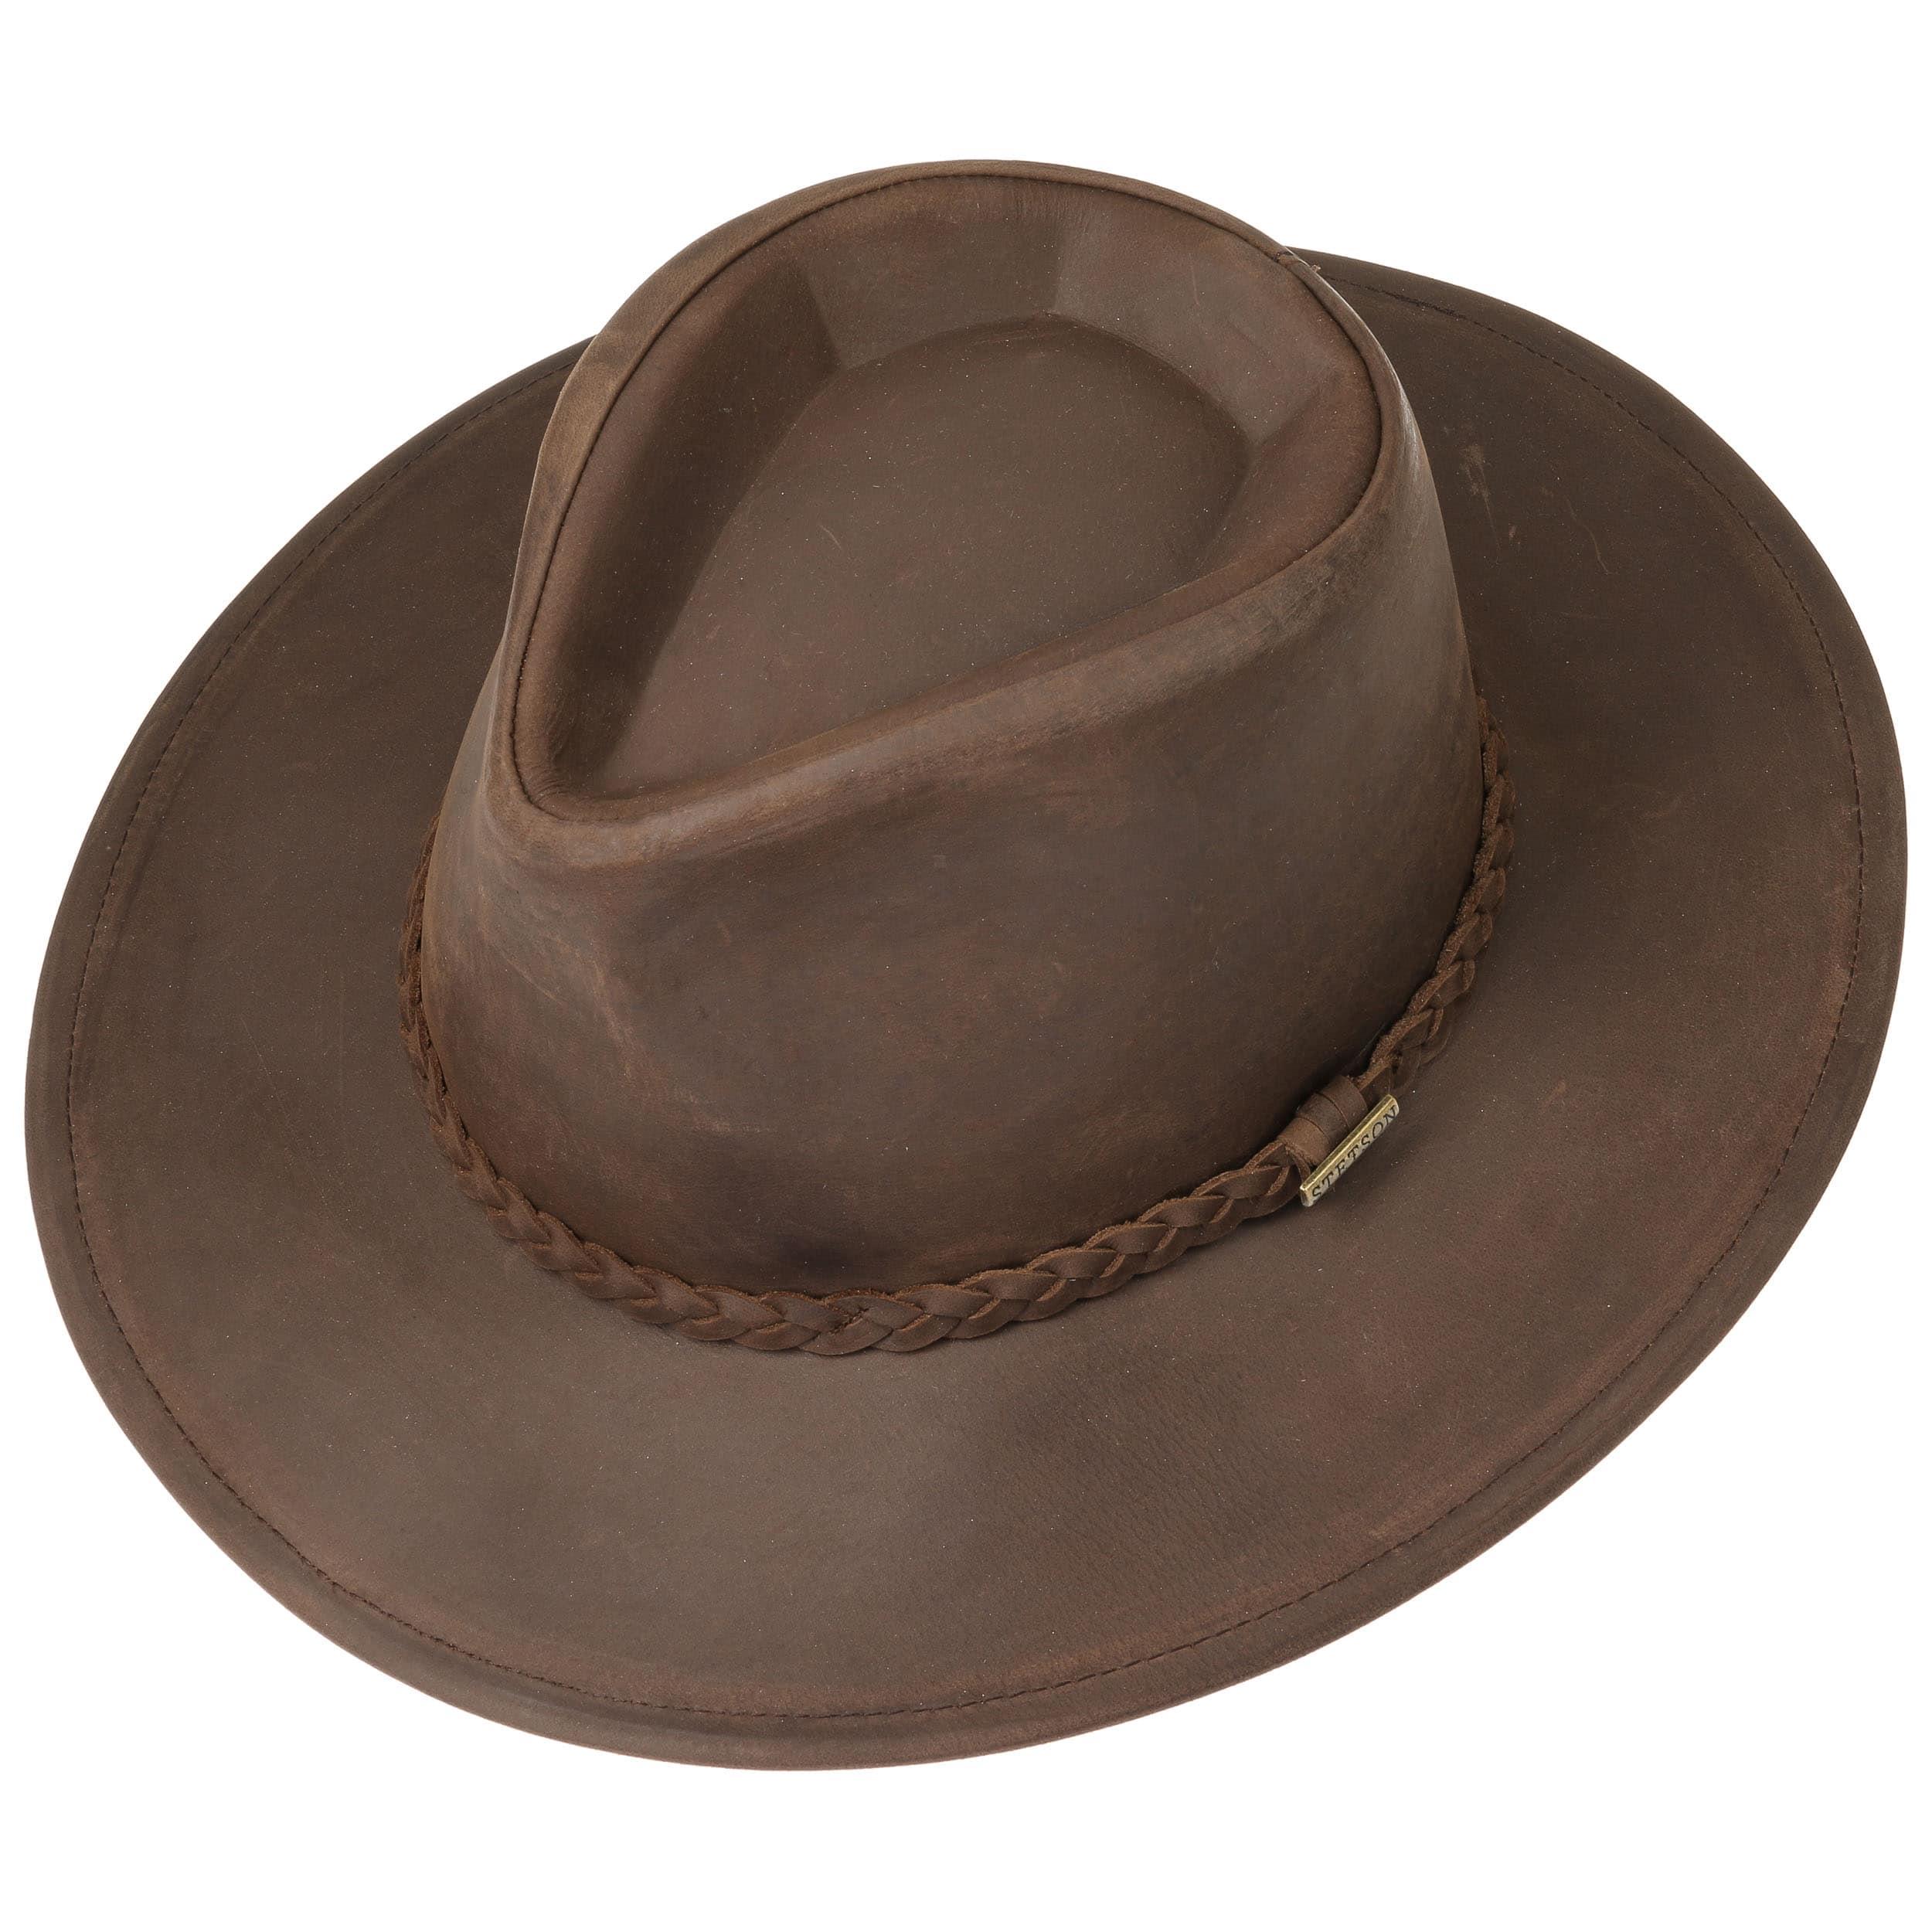 a72f091df16 Buffalo Leather Western Hat by Stetson - dark brown 1 ...